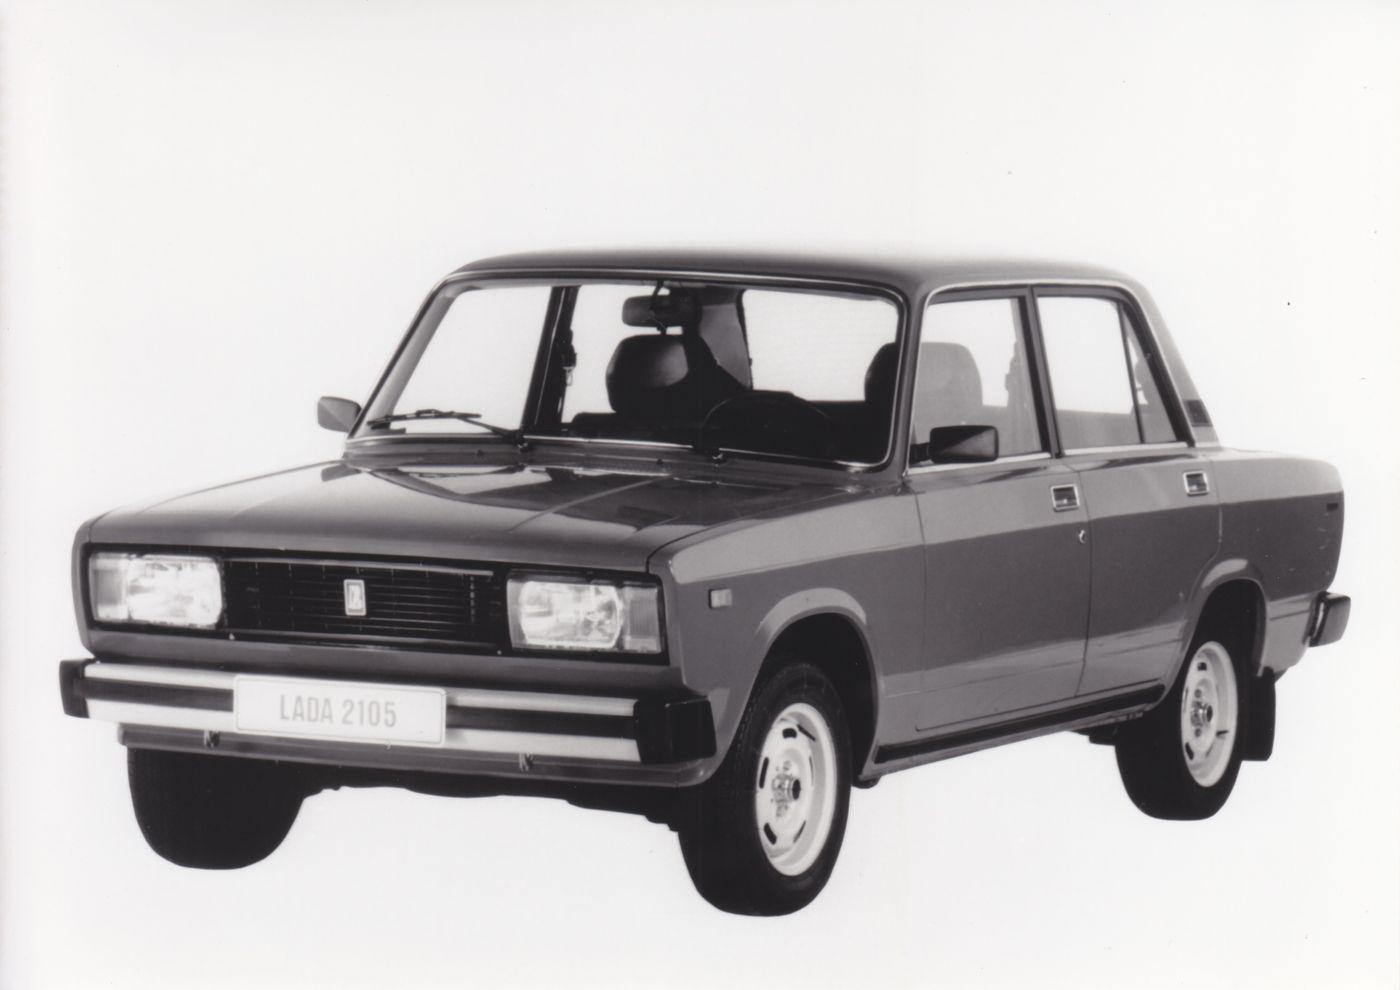 Lada 2105 Auto's en motoren, Motor, Auto's